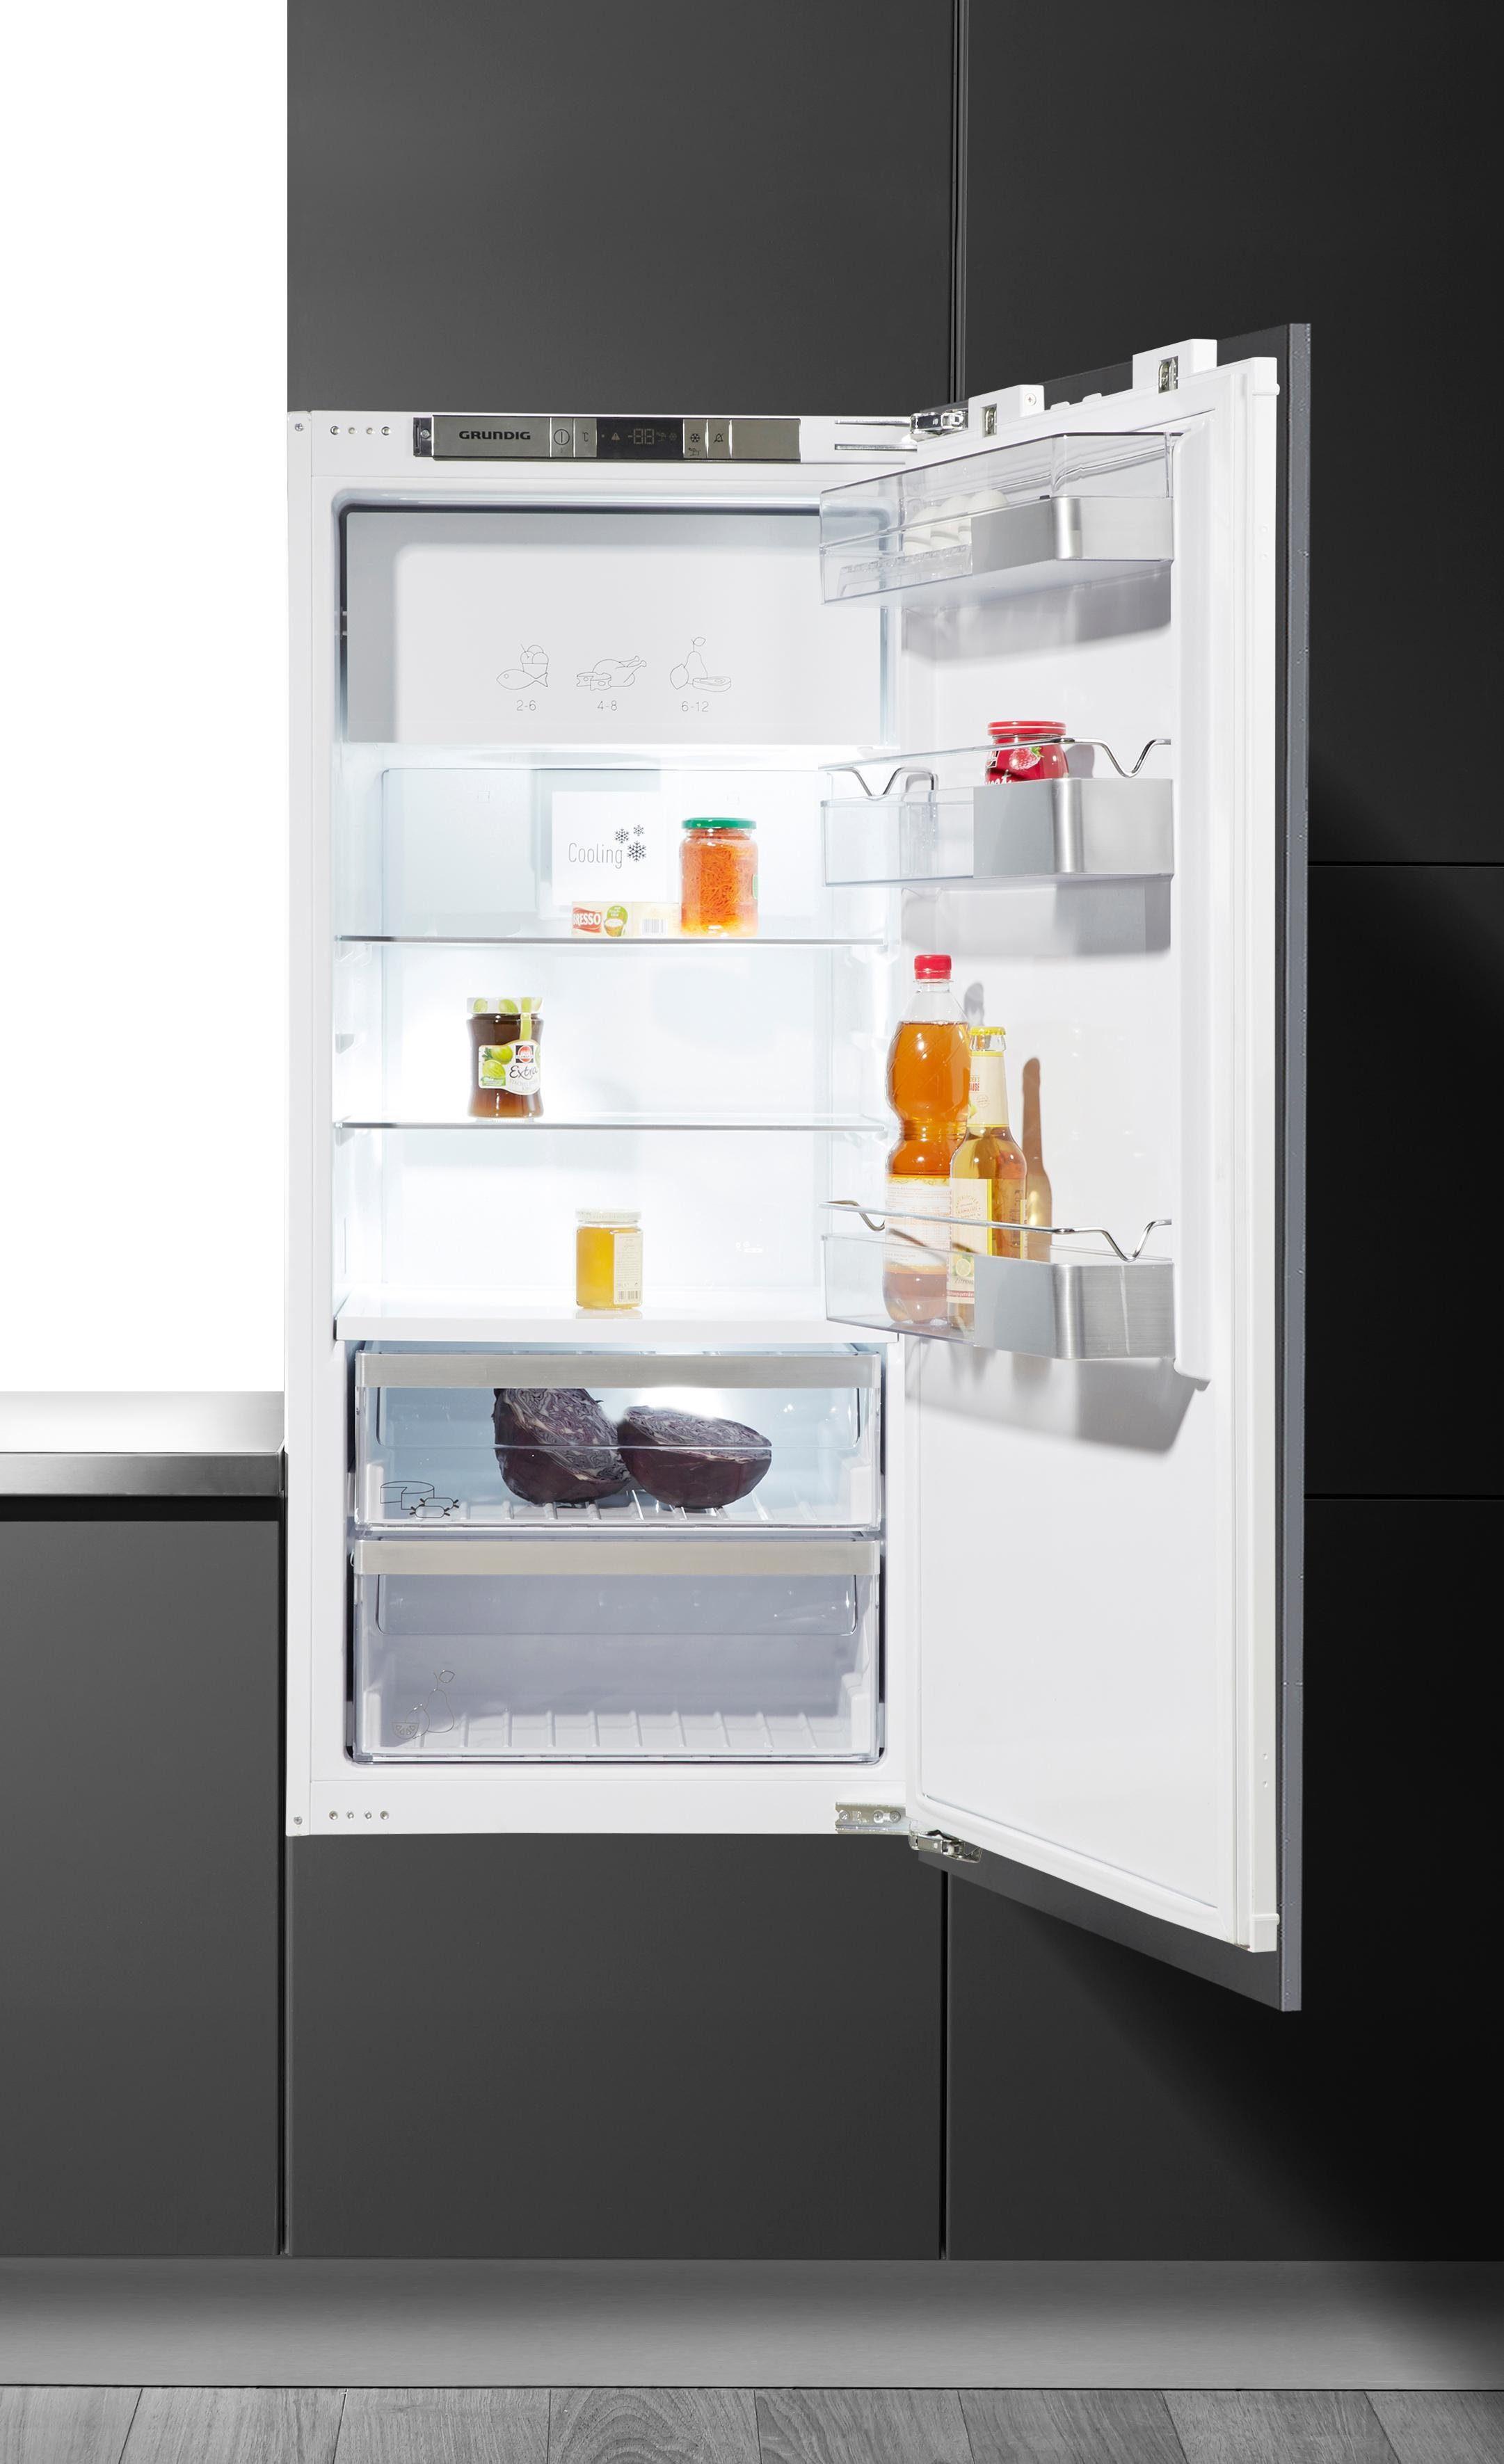 Grundig integrierbarer Einbau-Kühlschrank GTNI 14331, A+++